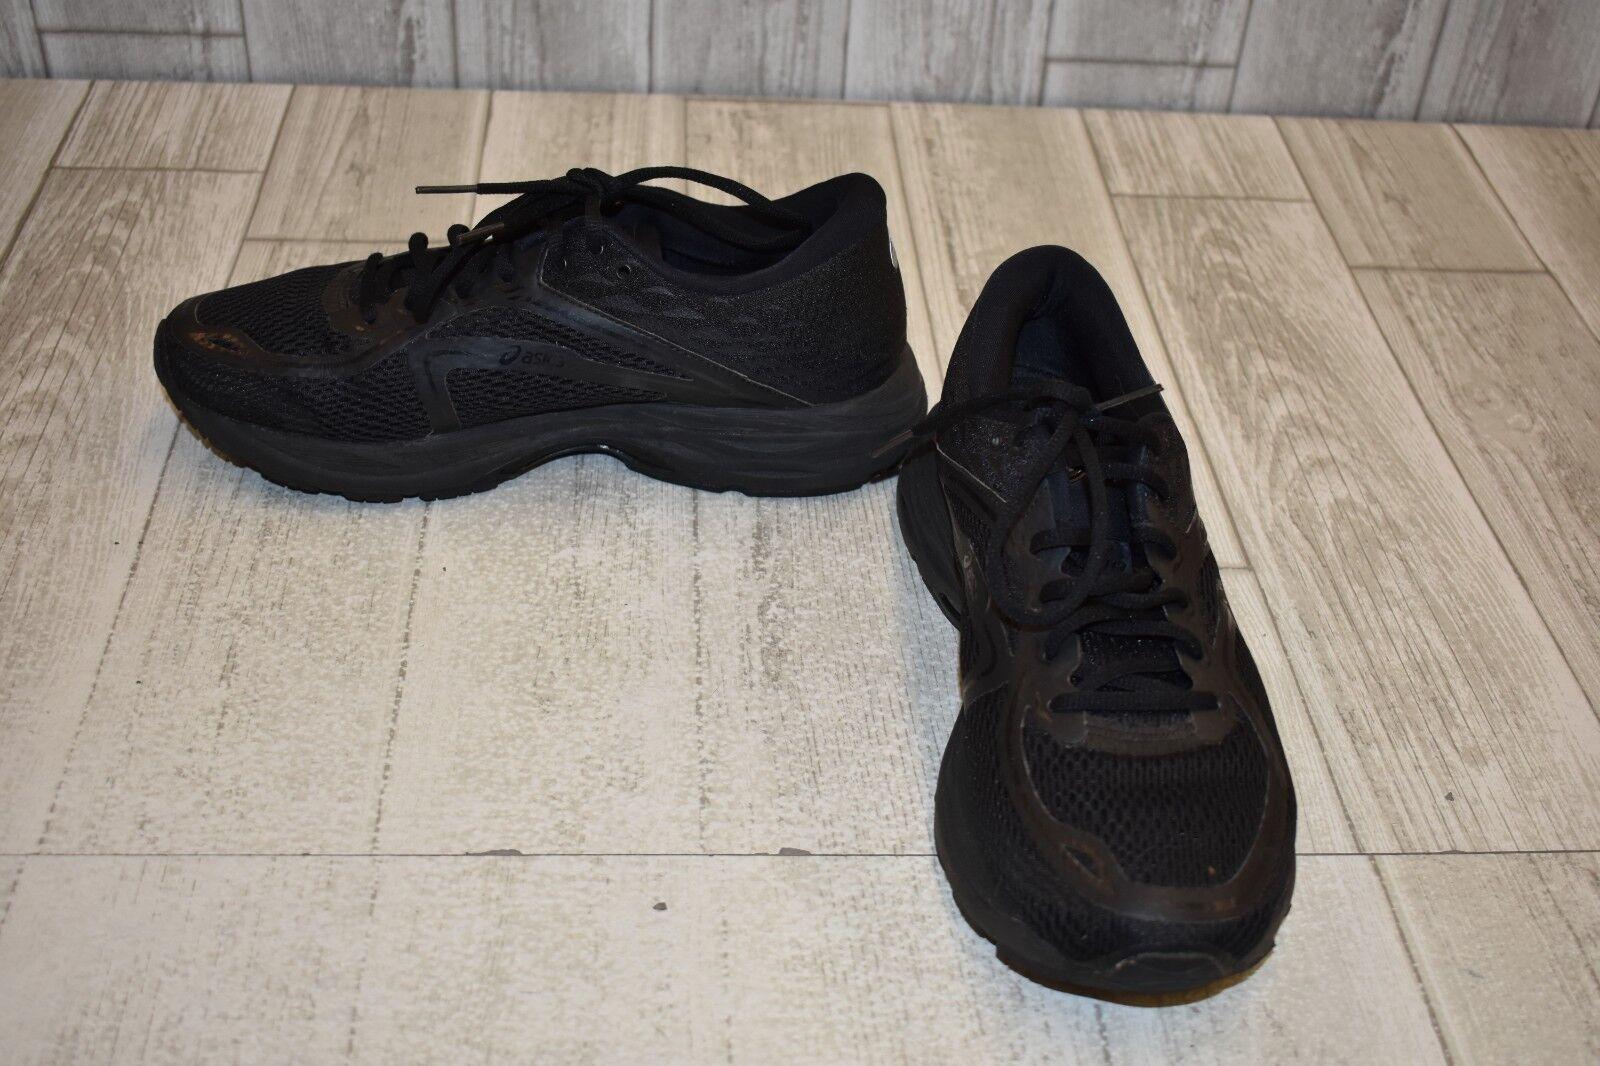 Asics Gel Cumulus 19 Running shoes, Men's Size 9, Black